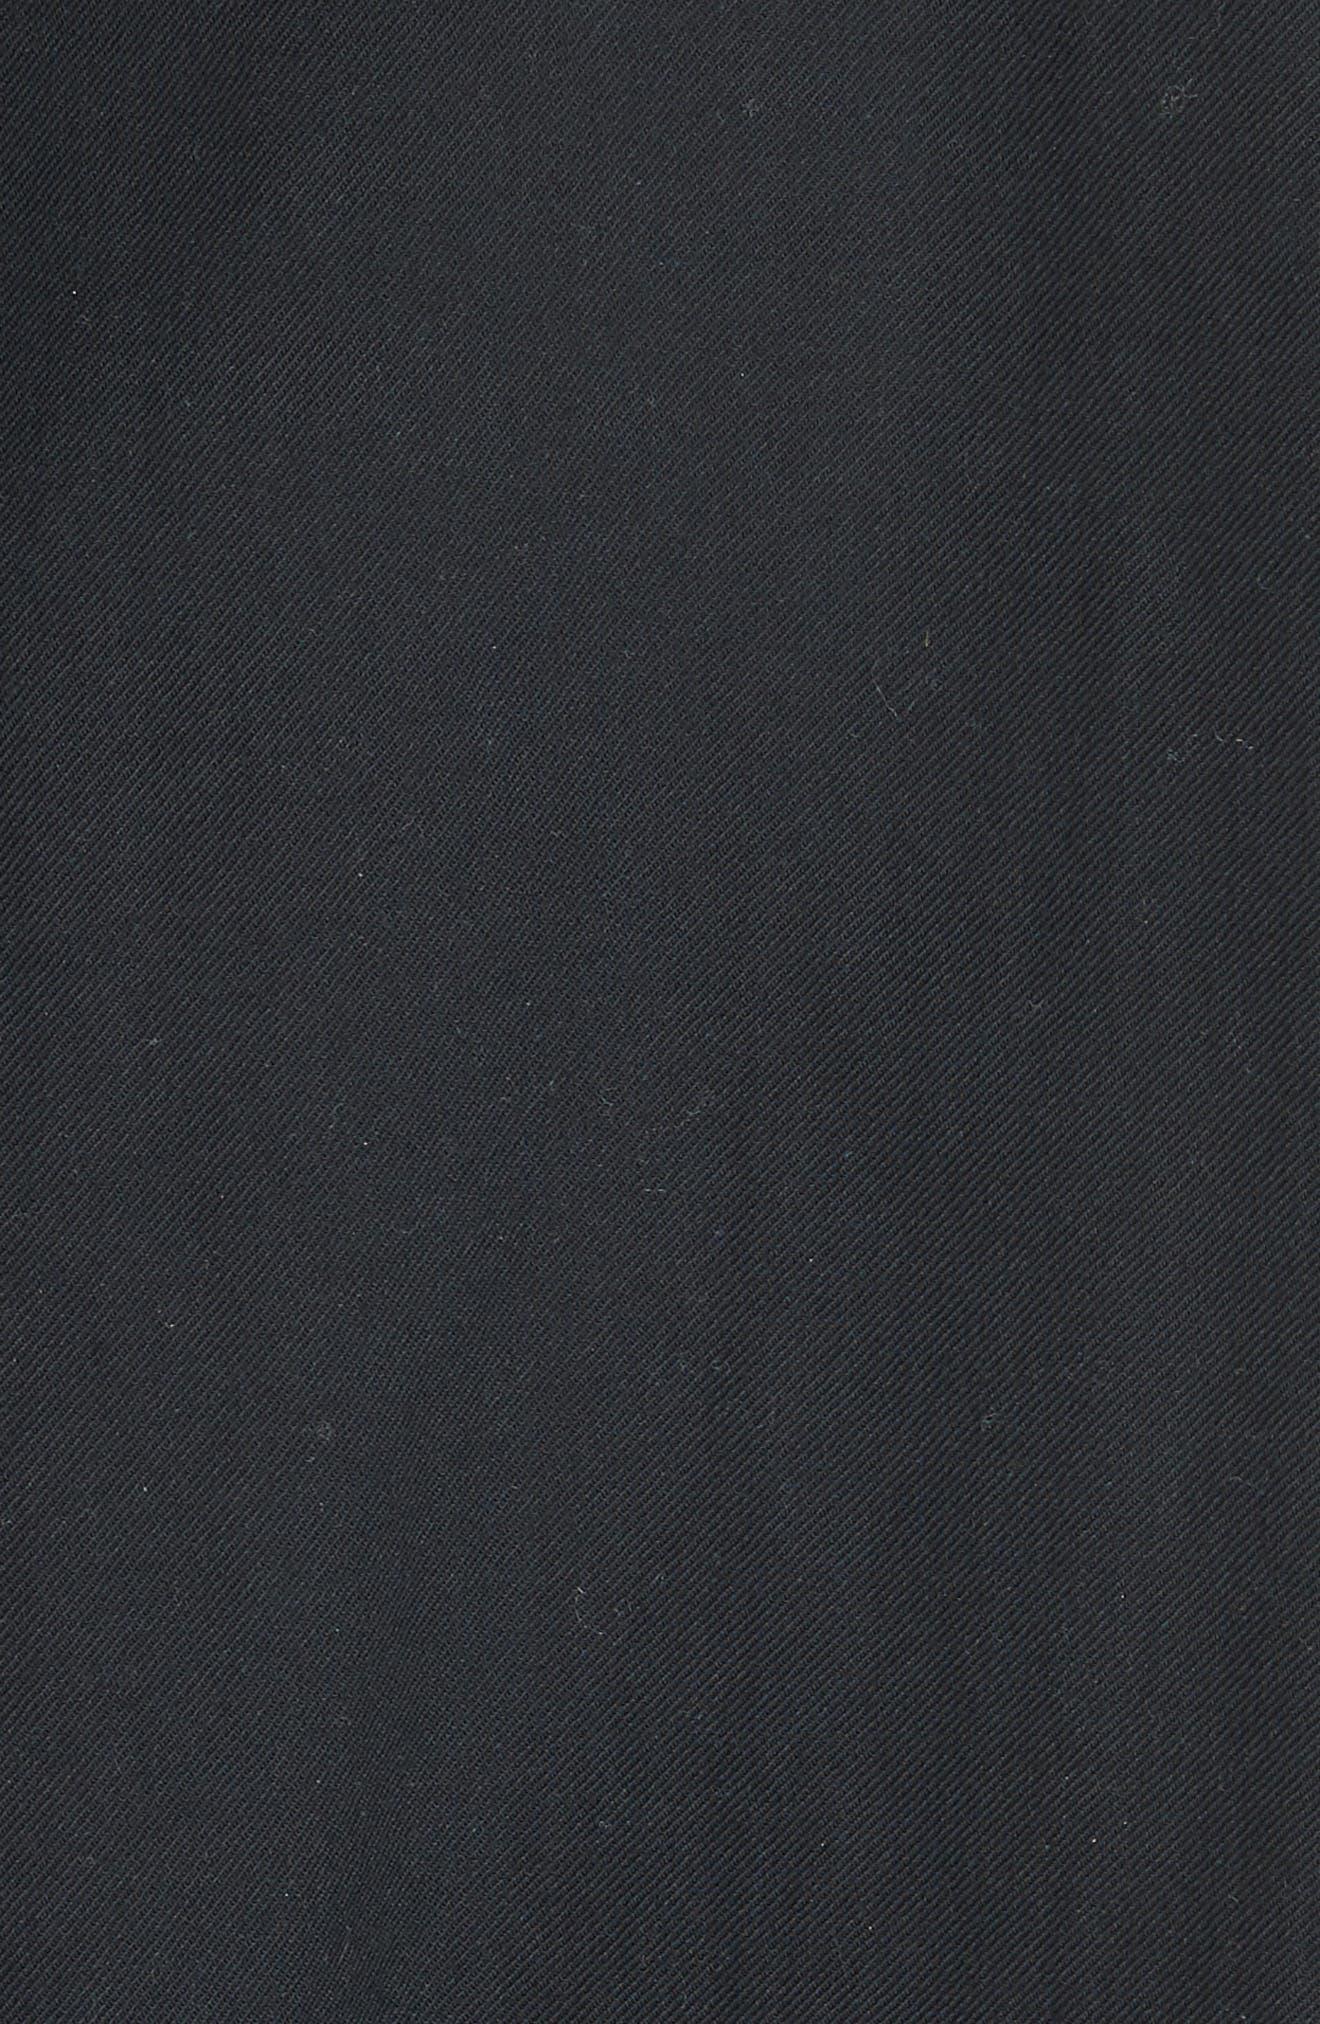 Shirred Cotton Blouse,                             Alternate thumbnail 5, color,                             001